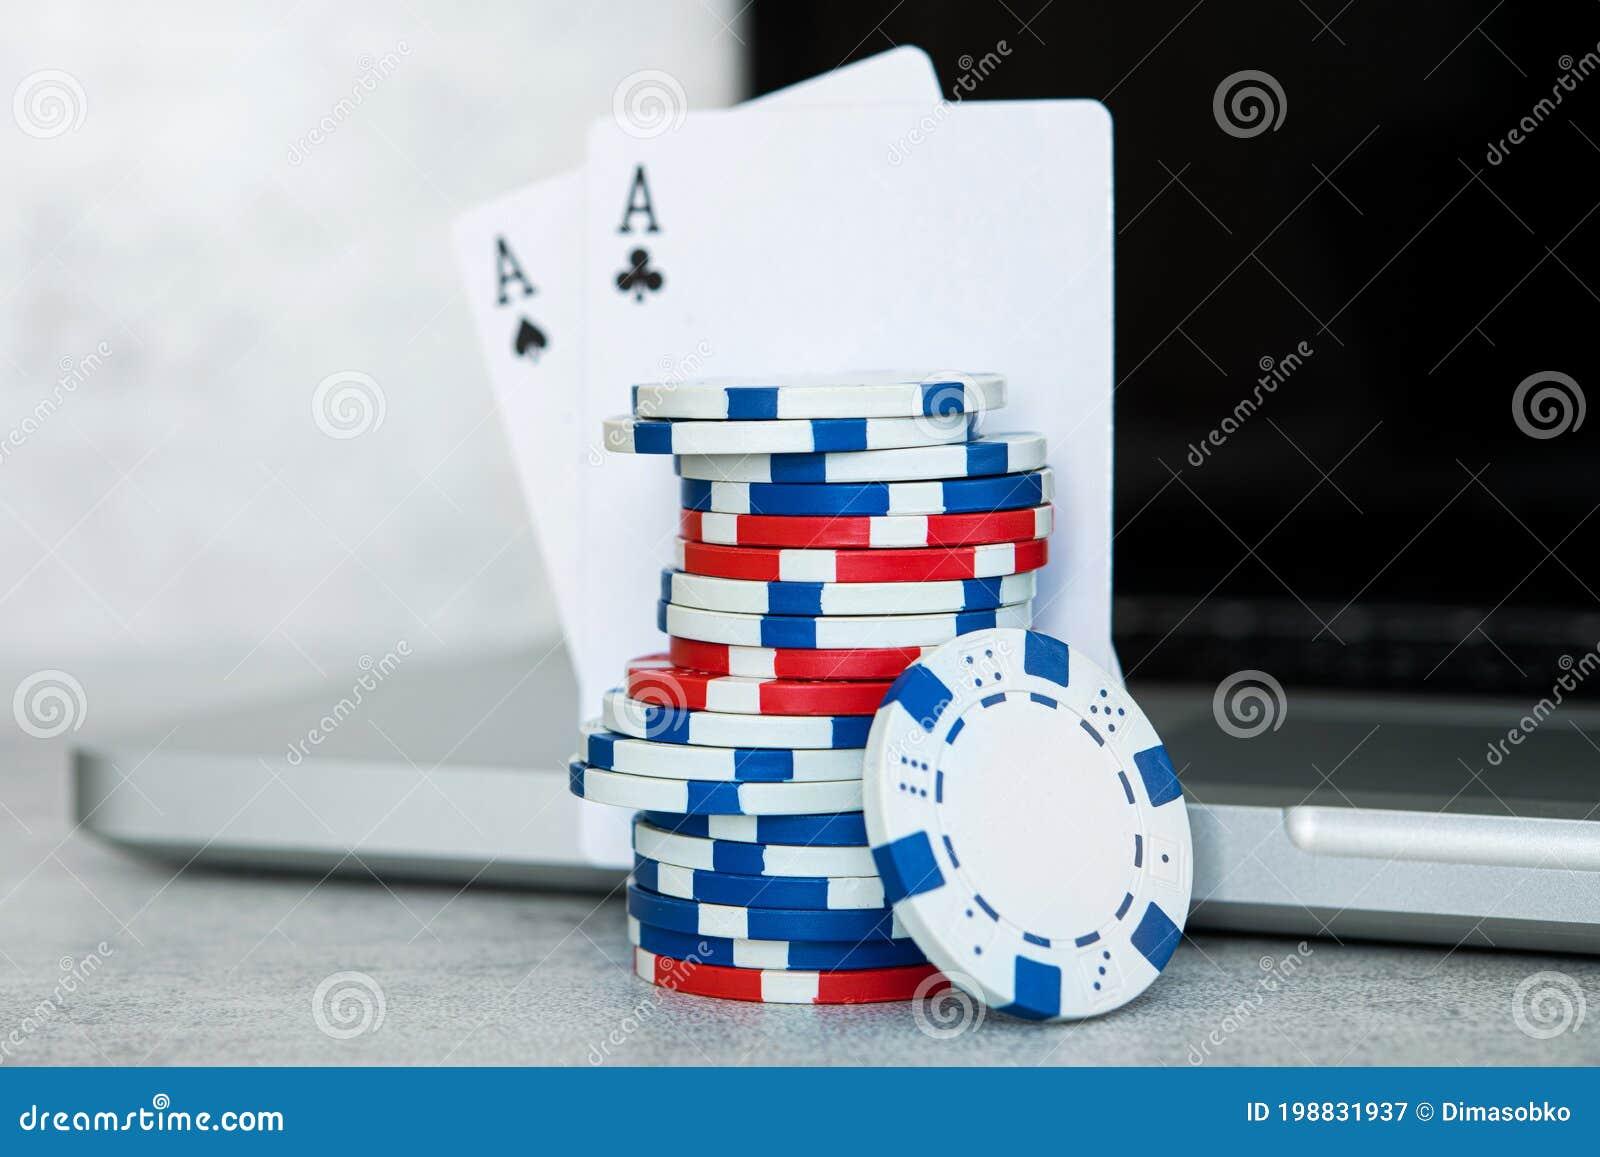 Cocnept Of Poker Online Games Stock Image Image Of Online Hands 198831937